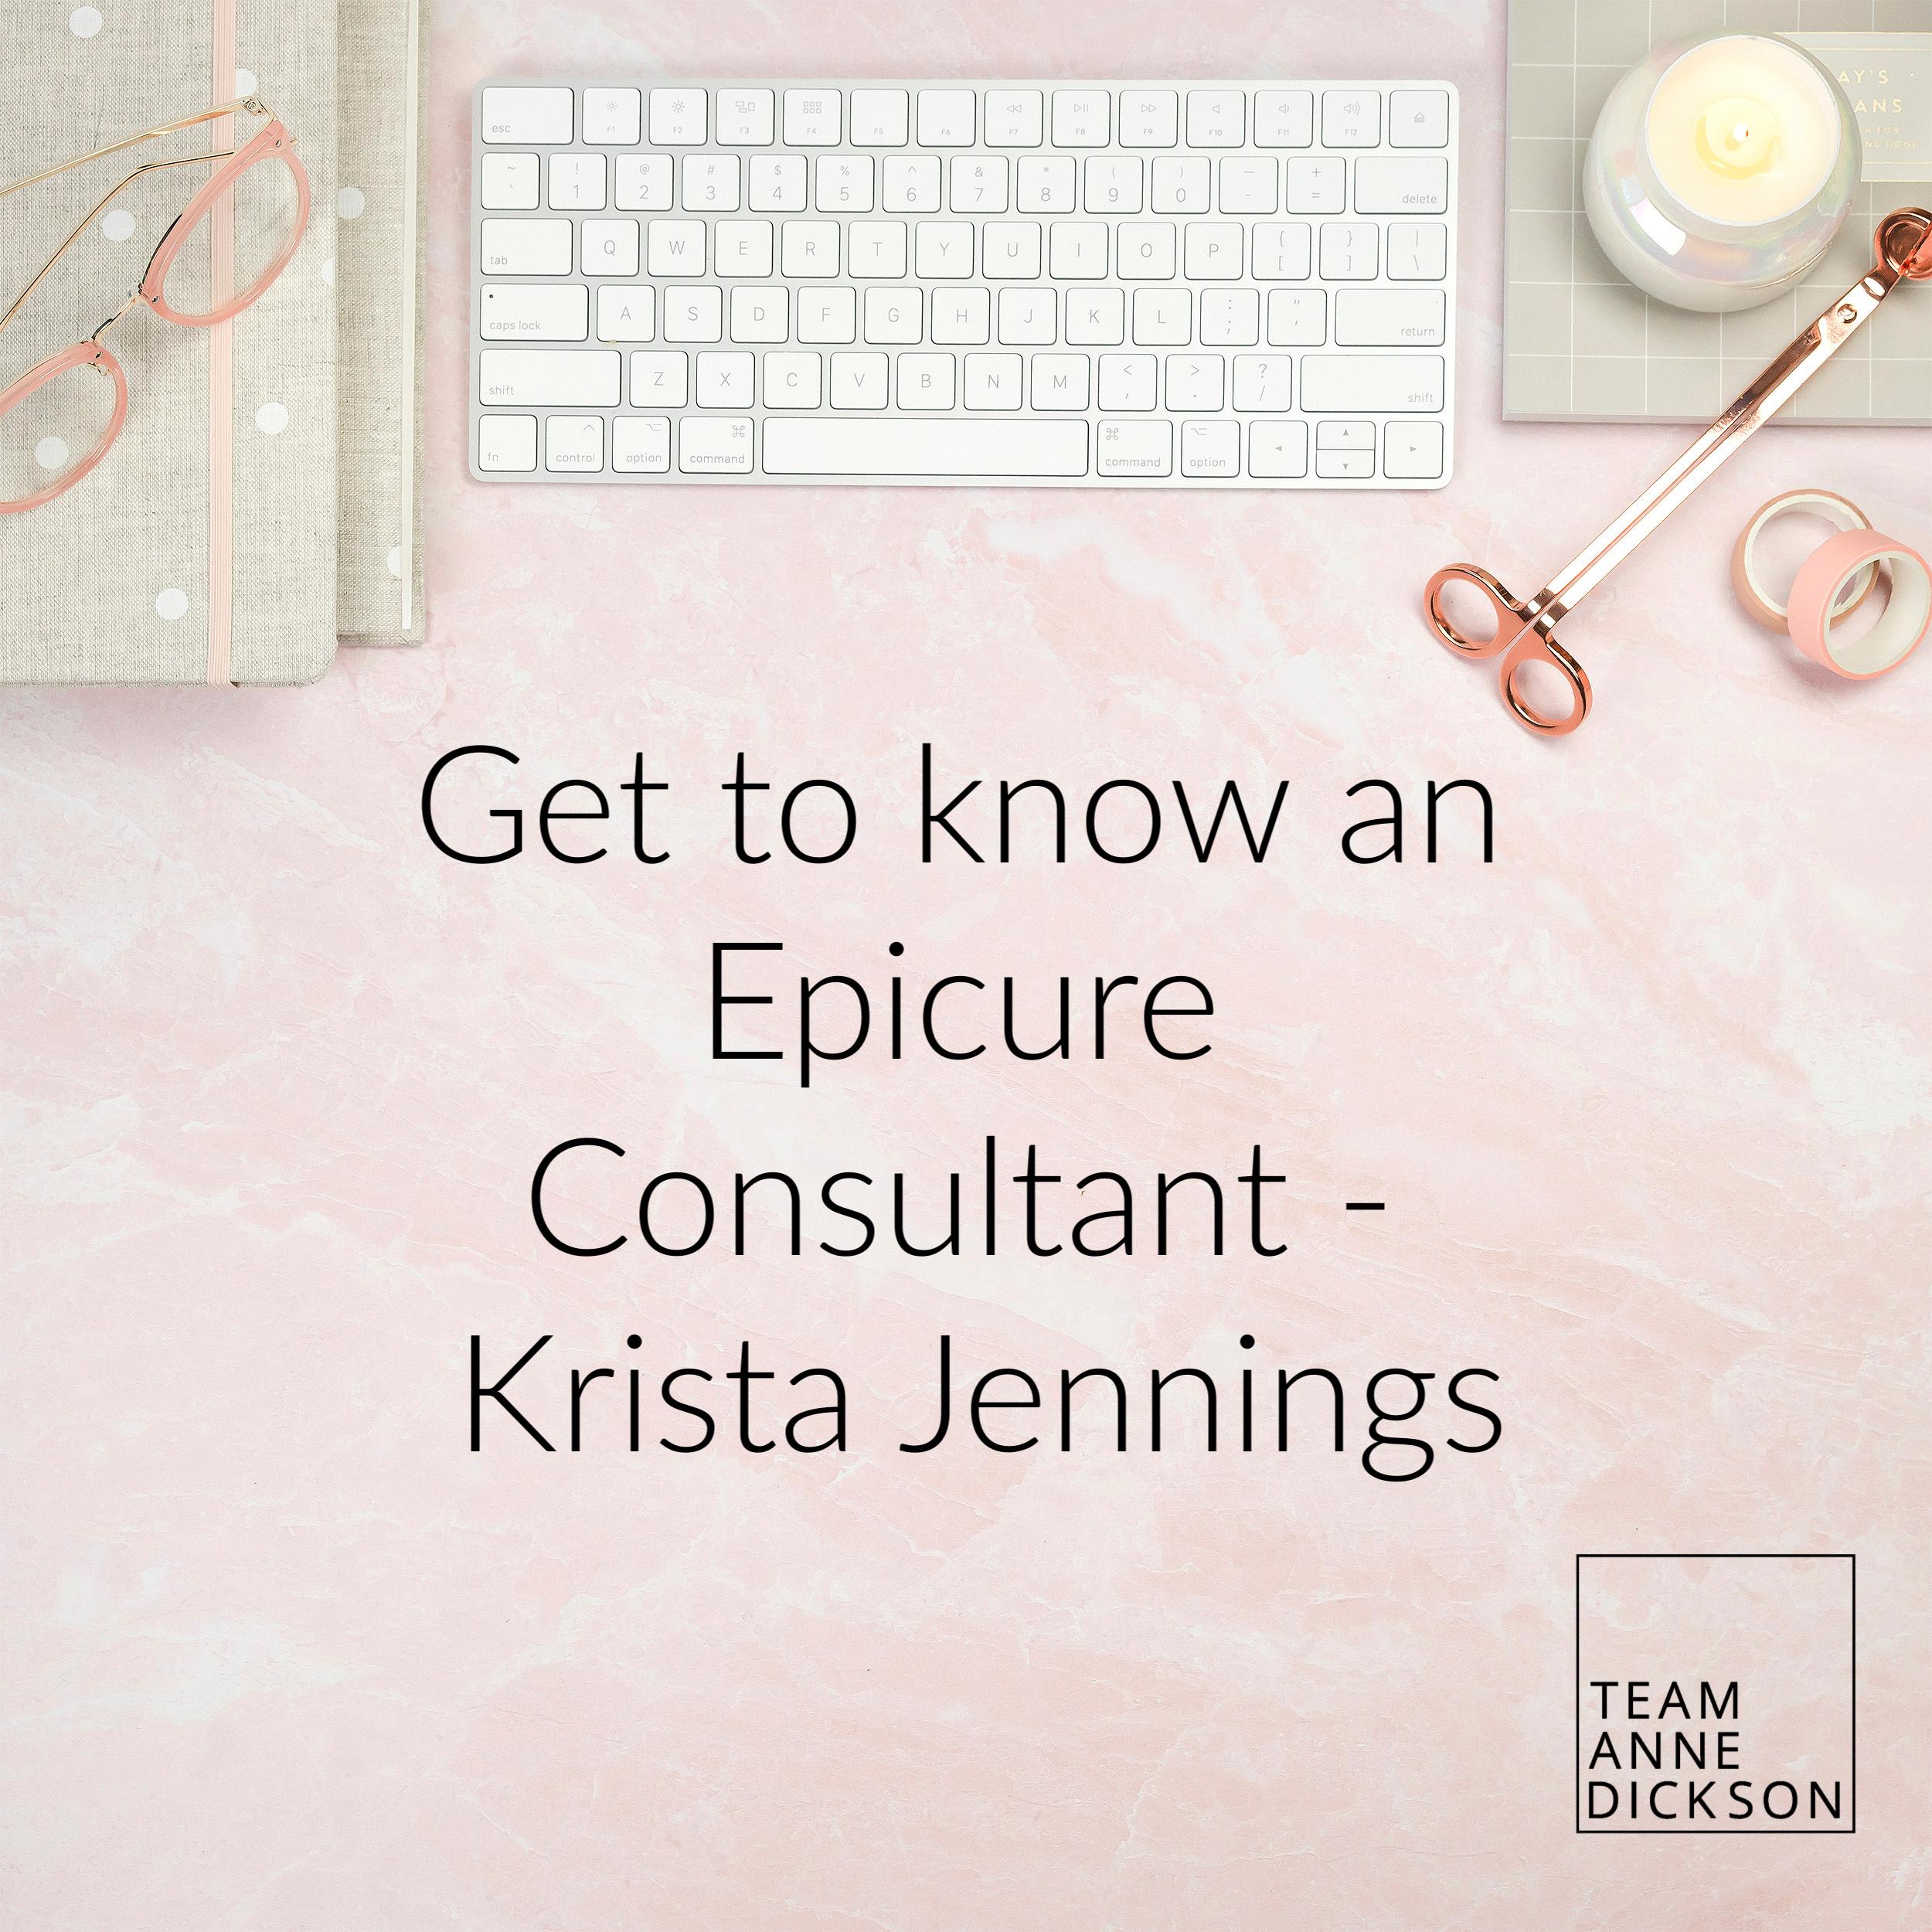 Epicure Consultant – Krista Jennings